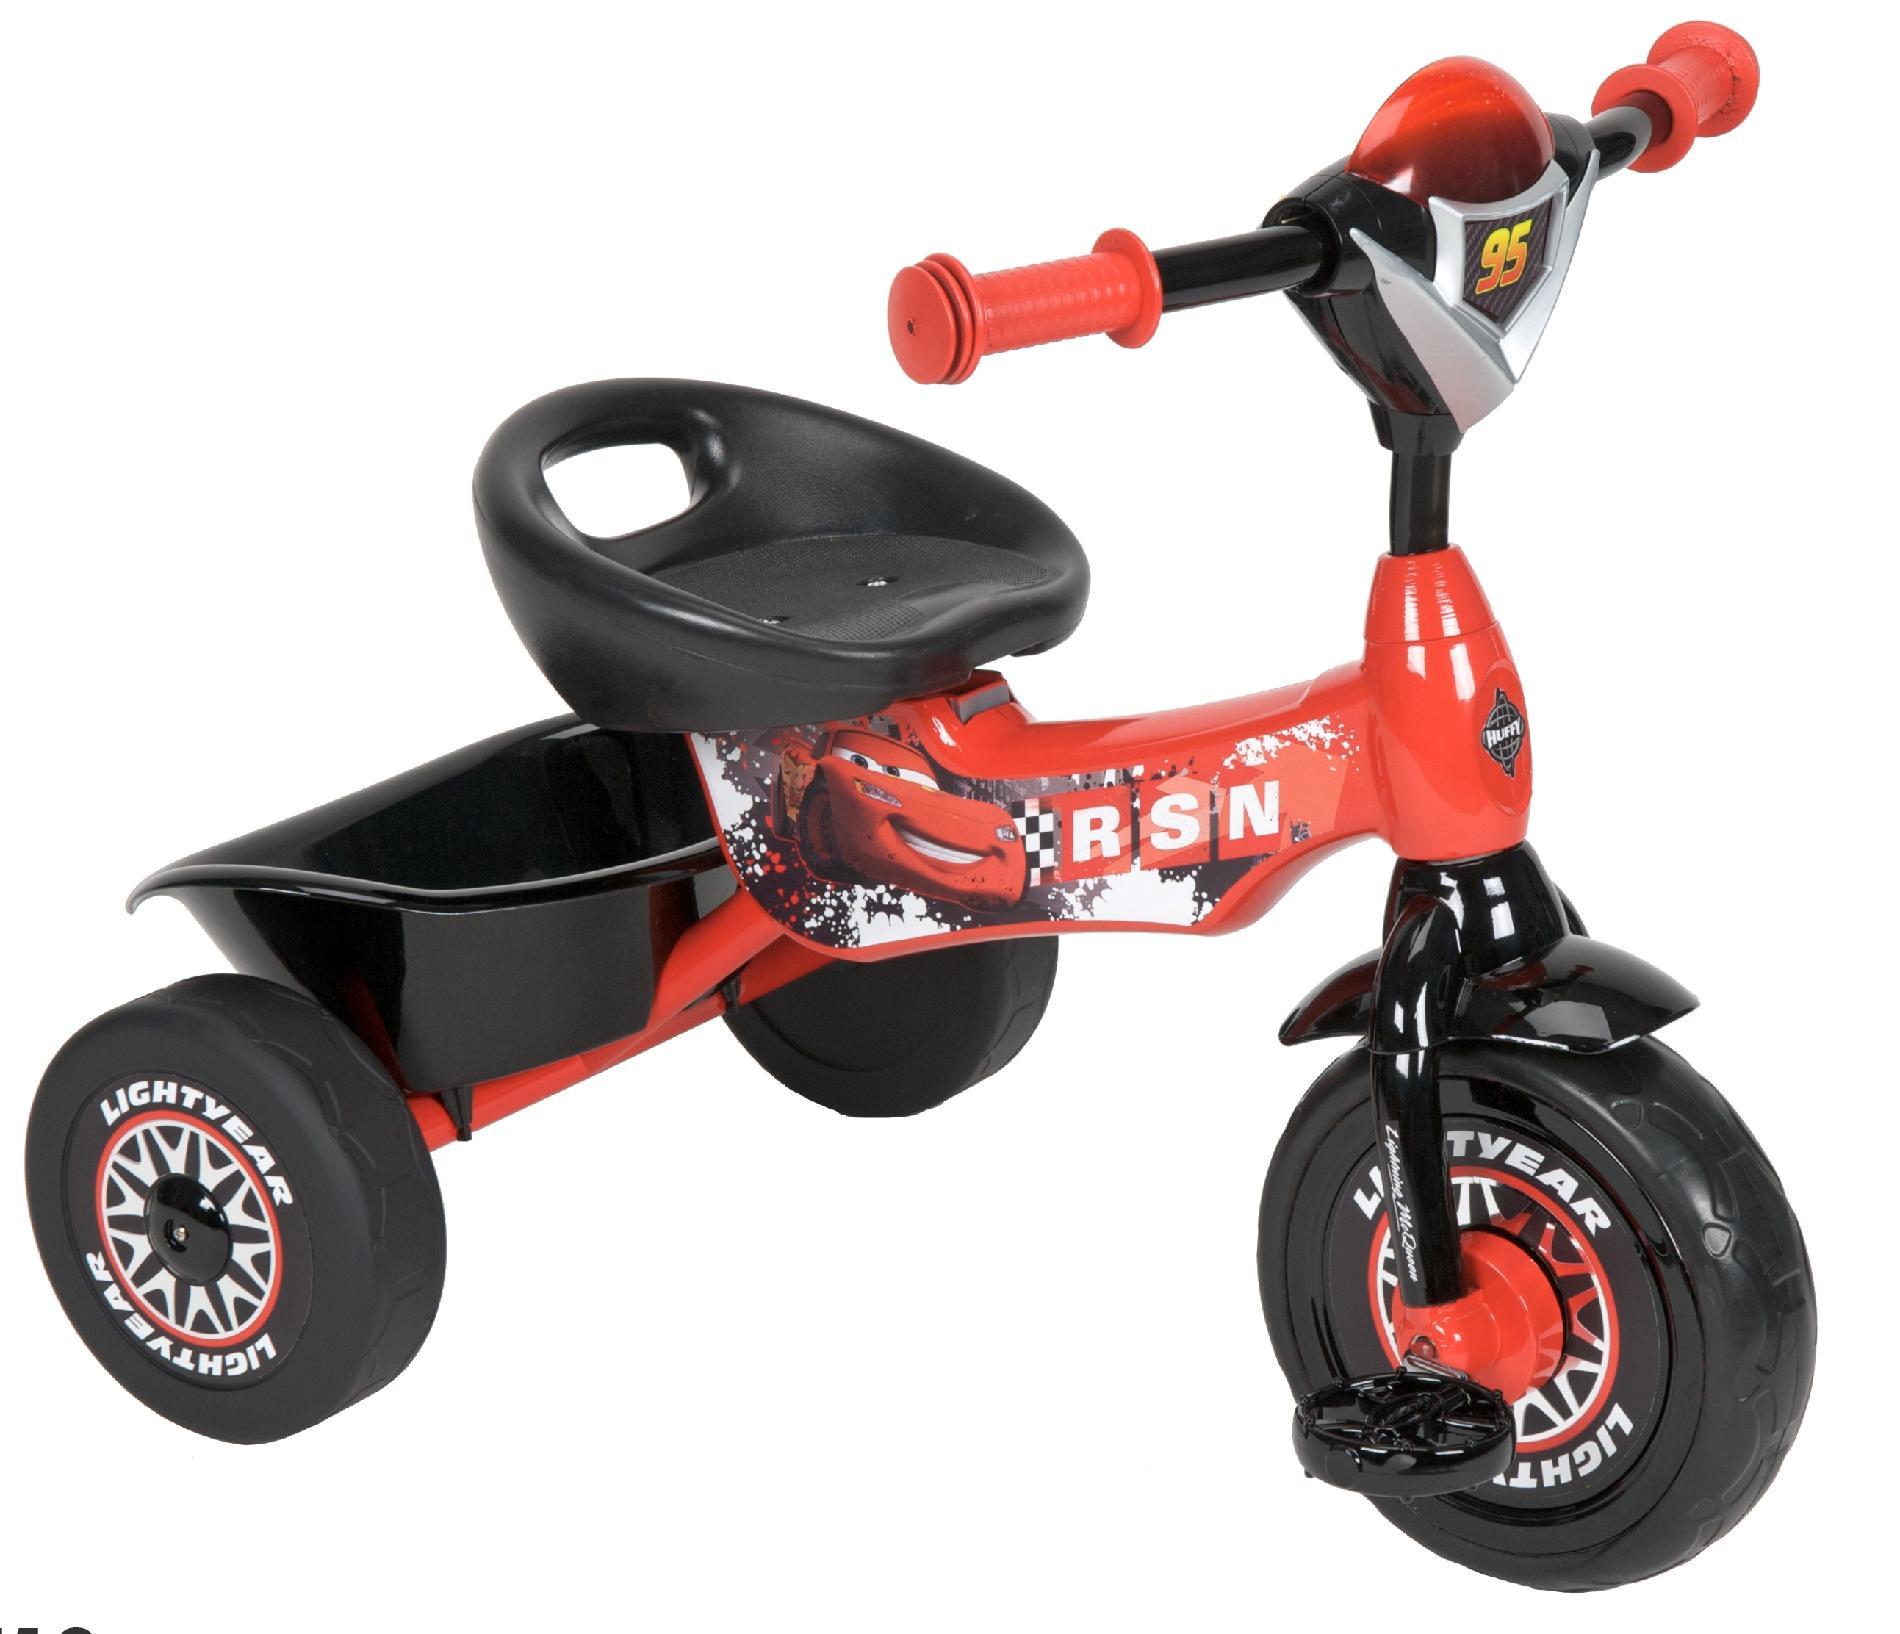 Disney Pixar Cars Tricycle Enjoy A Fun And Zippy Ride